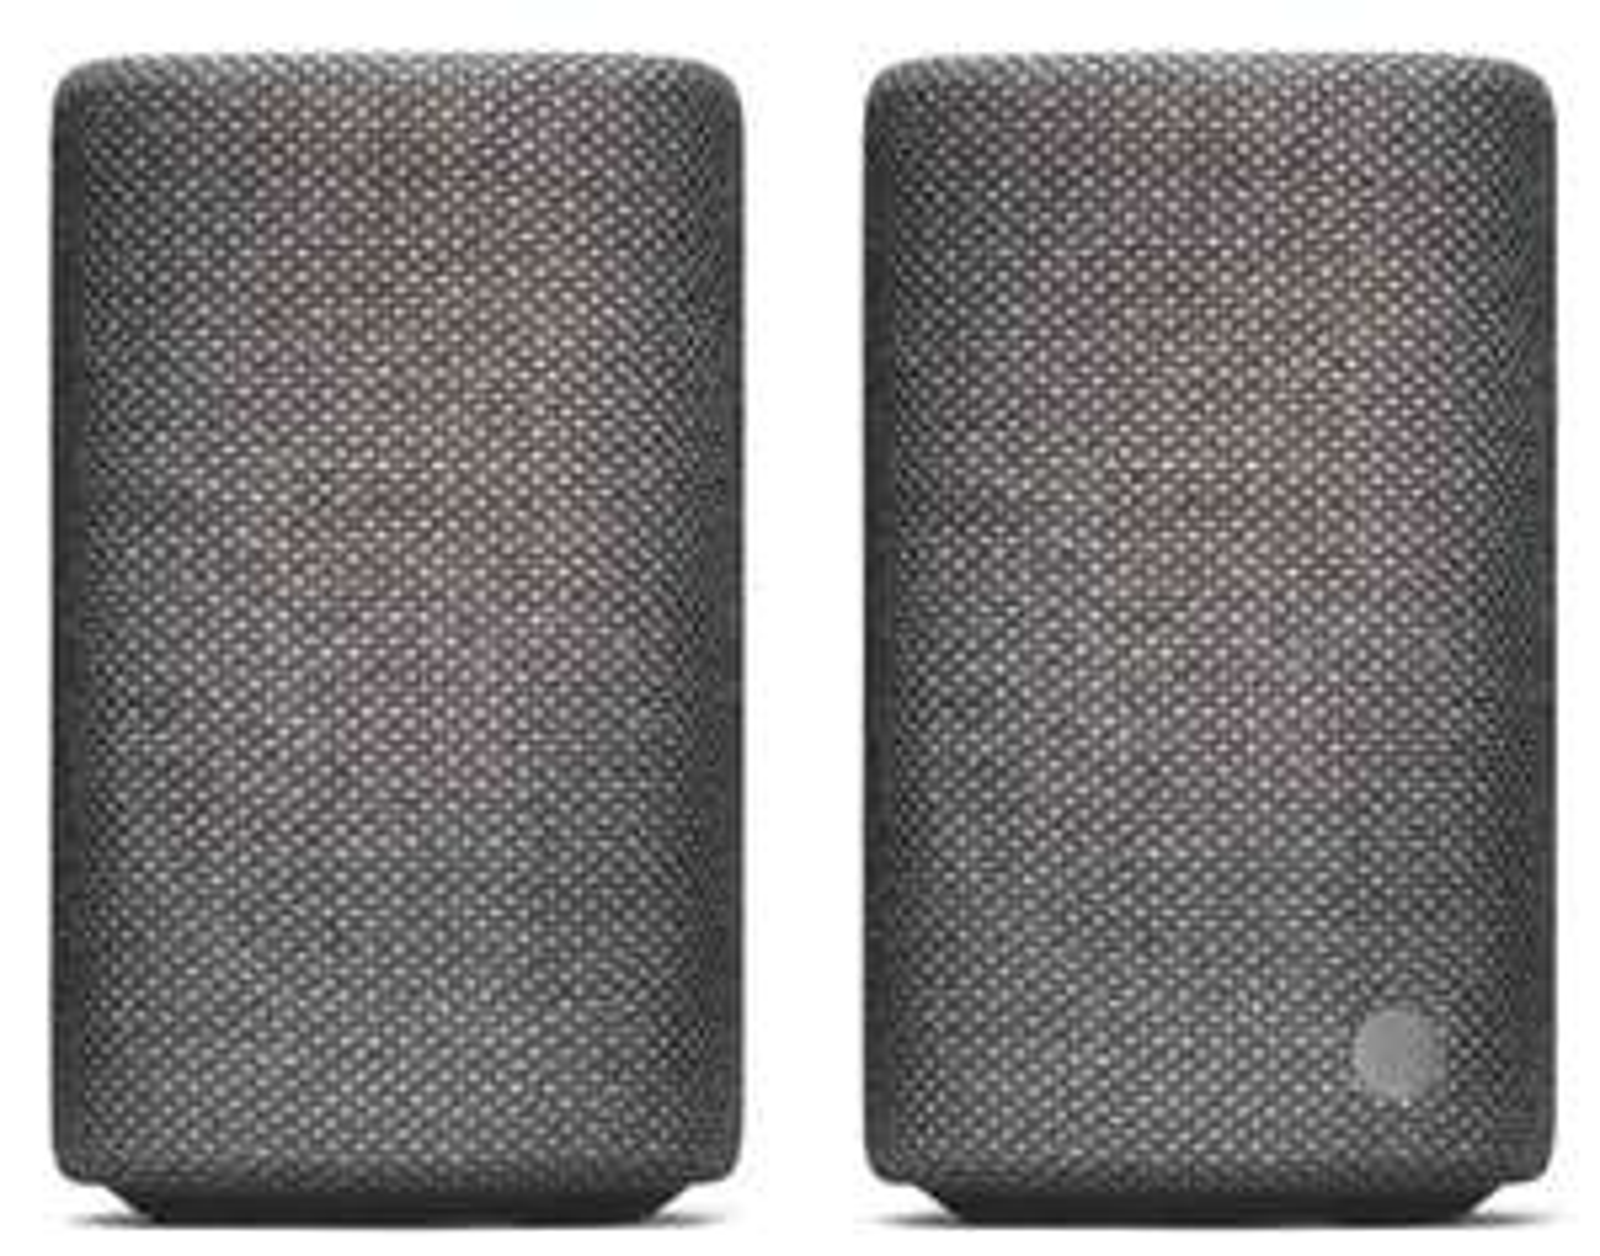 Cambridge Audio Yoyo M || Portable Stereo Bluetoothlautsprecher